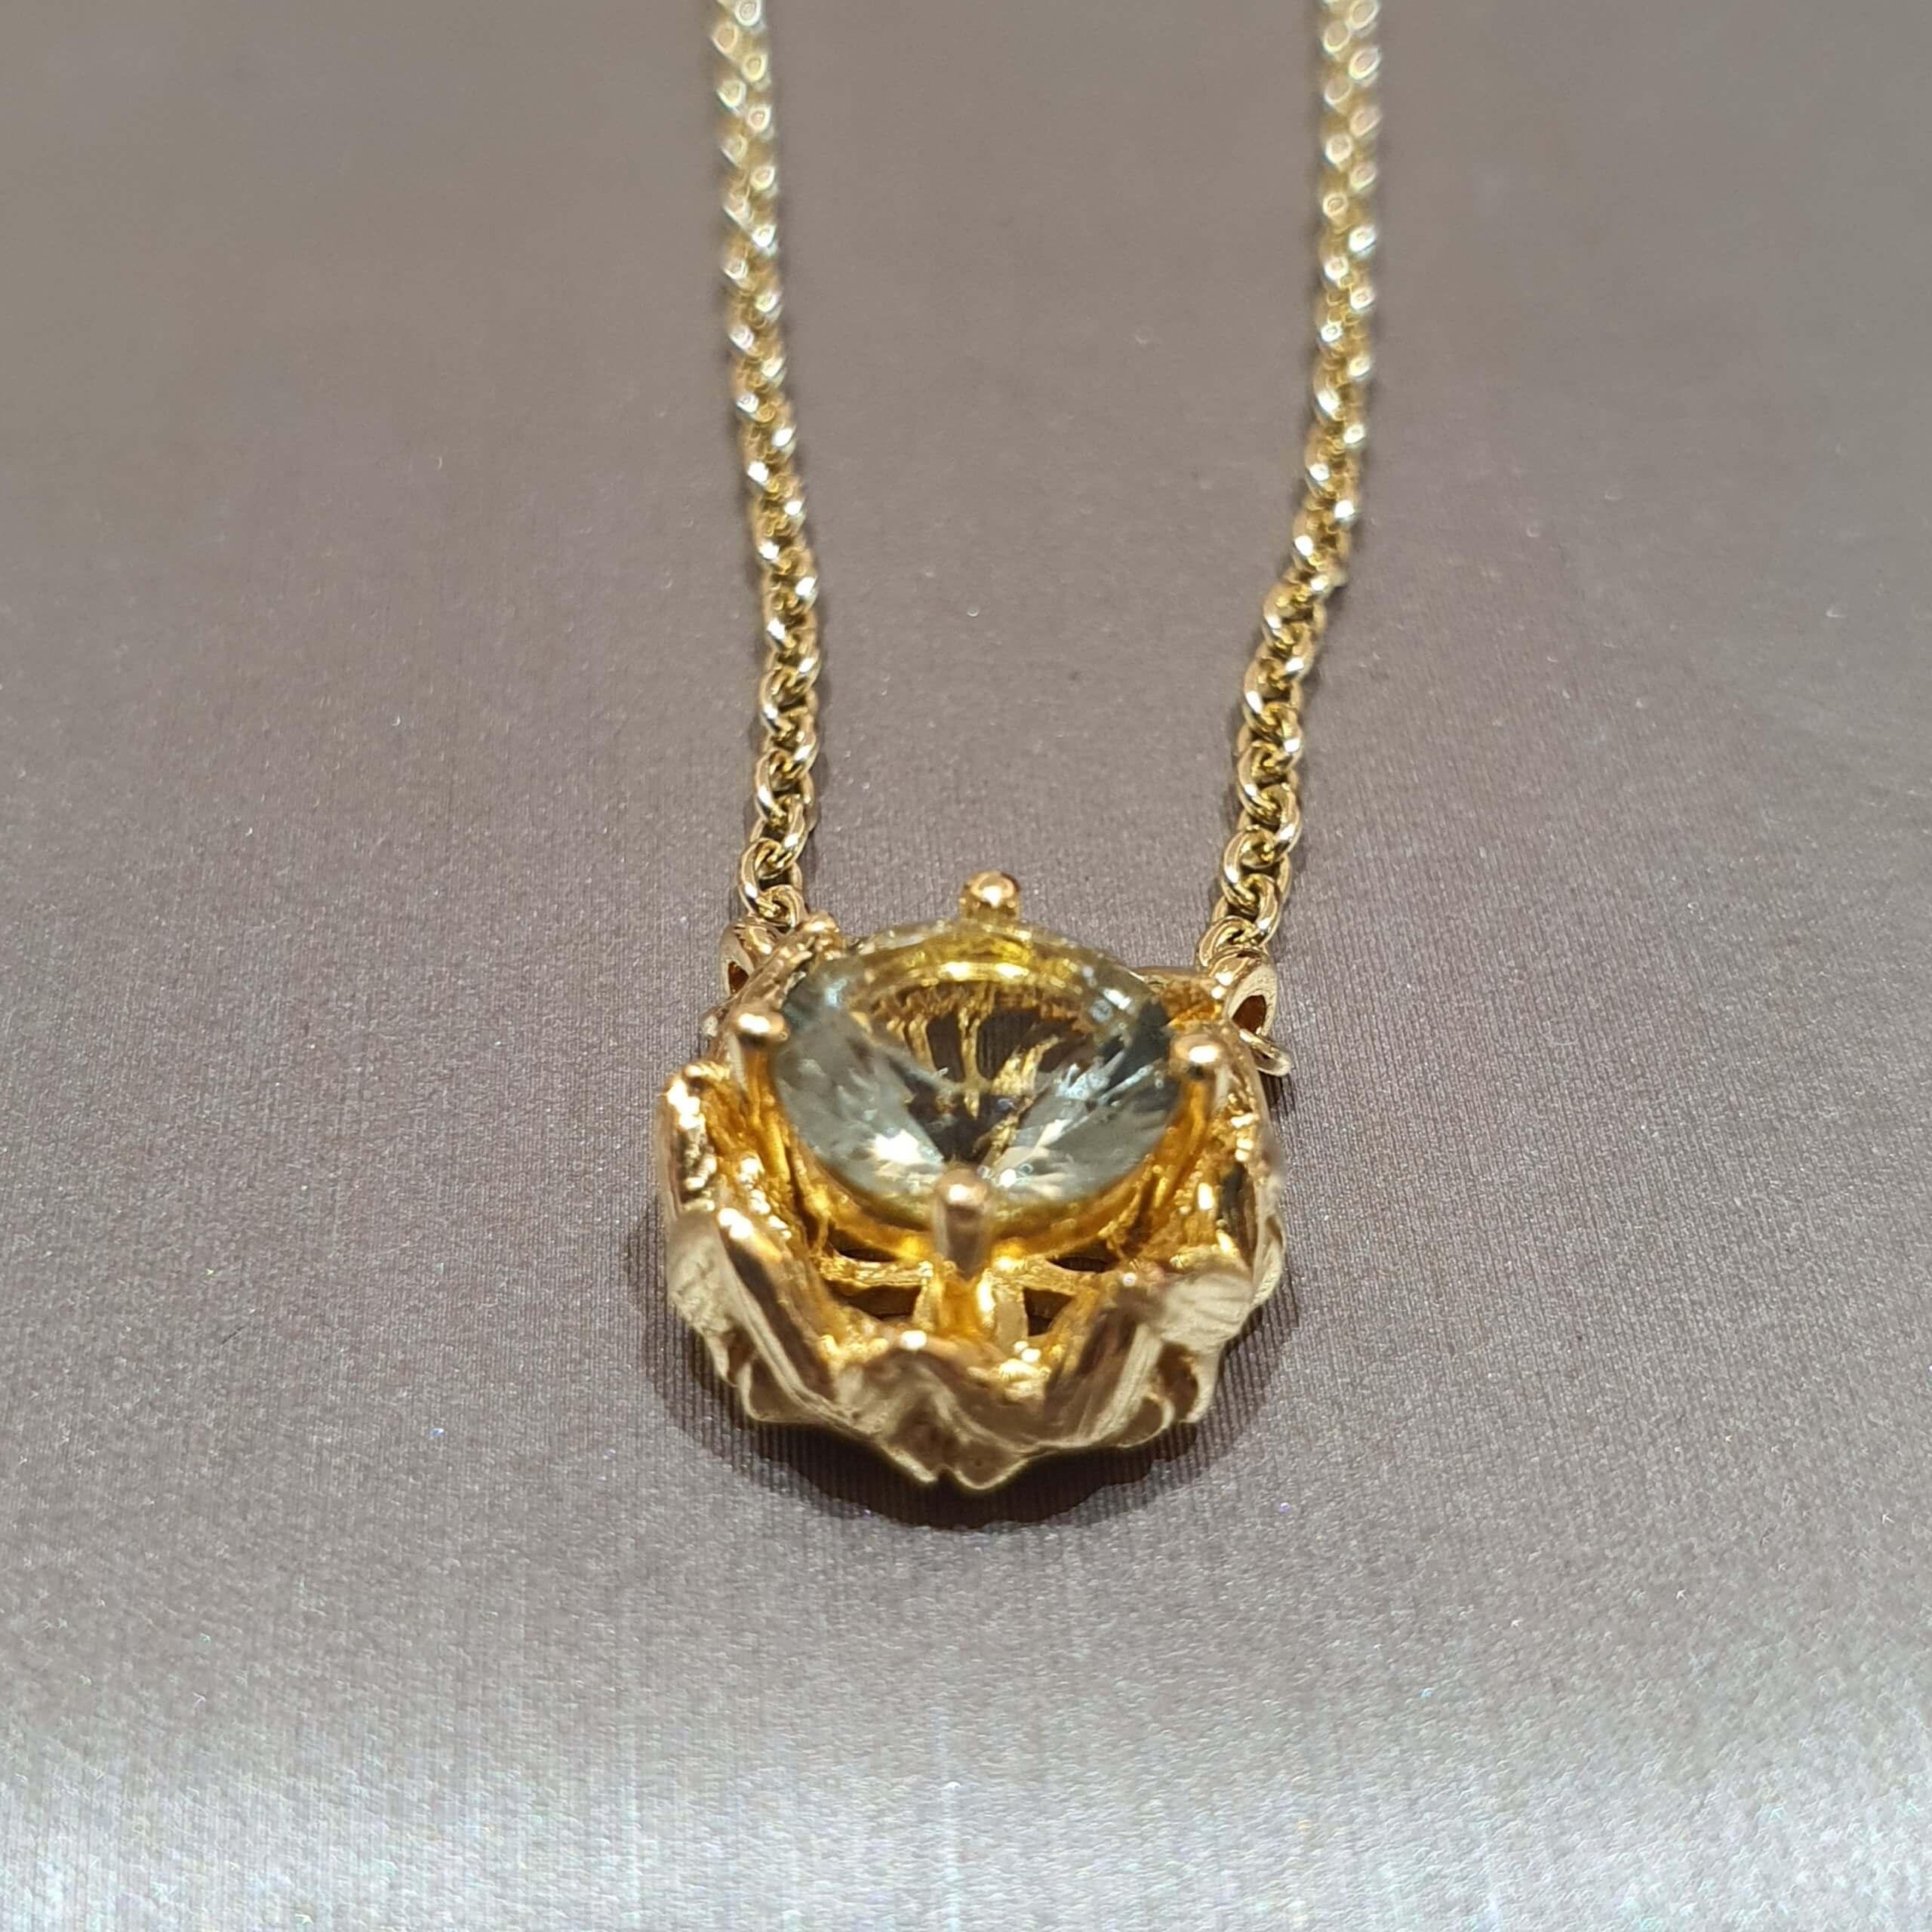 RISIS Mifuyu Fukai Midori Collection Necklace